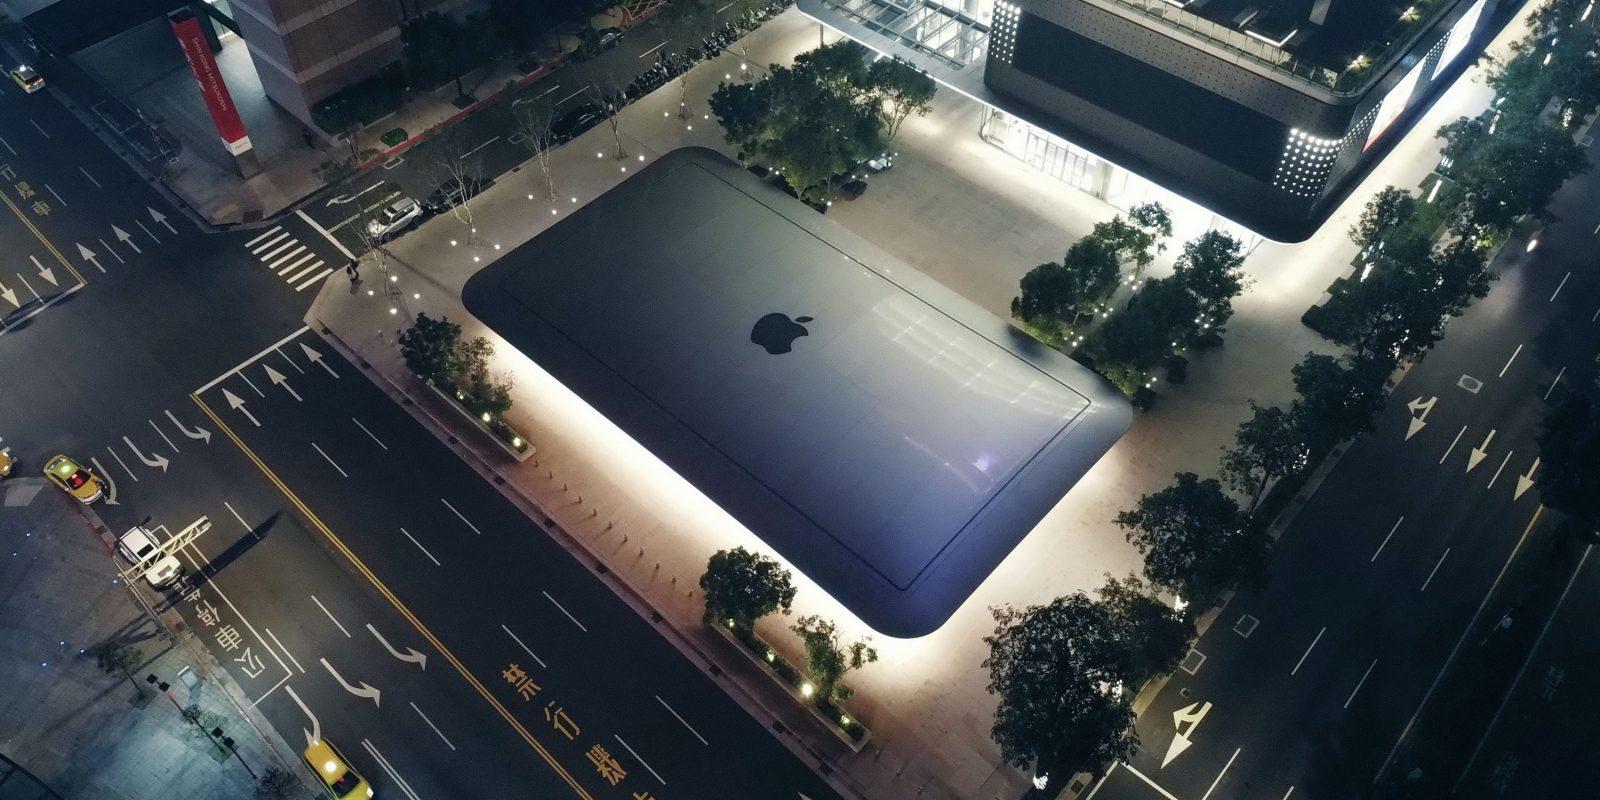 Apple easily remained 5G smartphone market leader despite seasonal dip